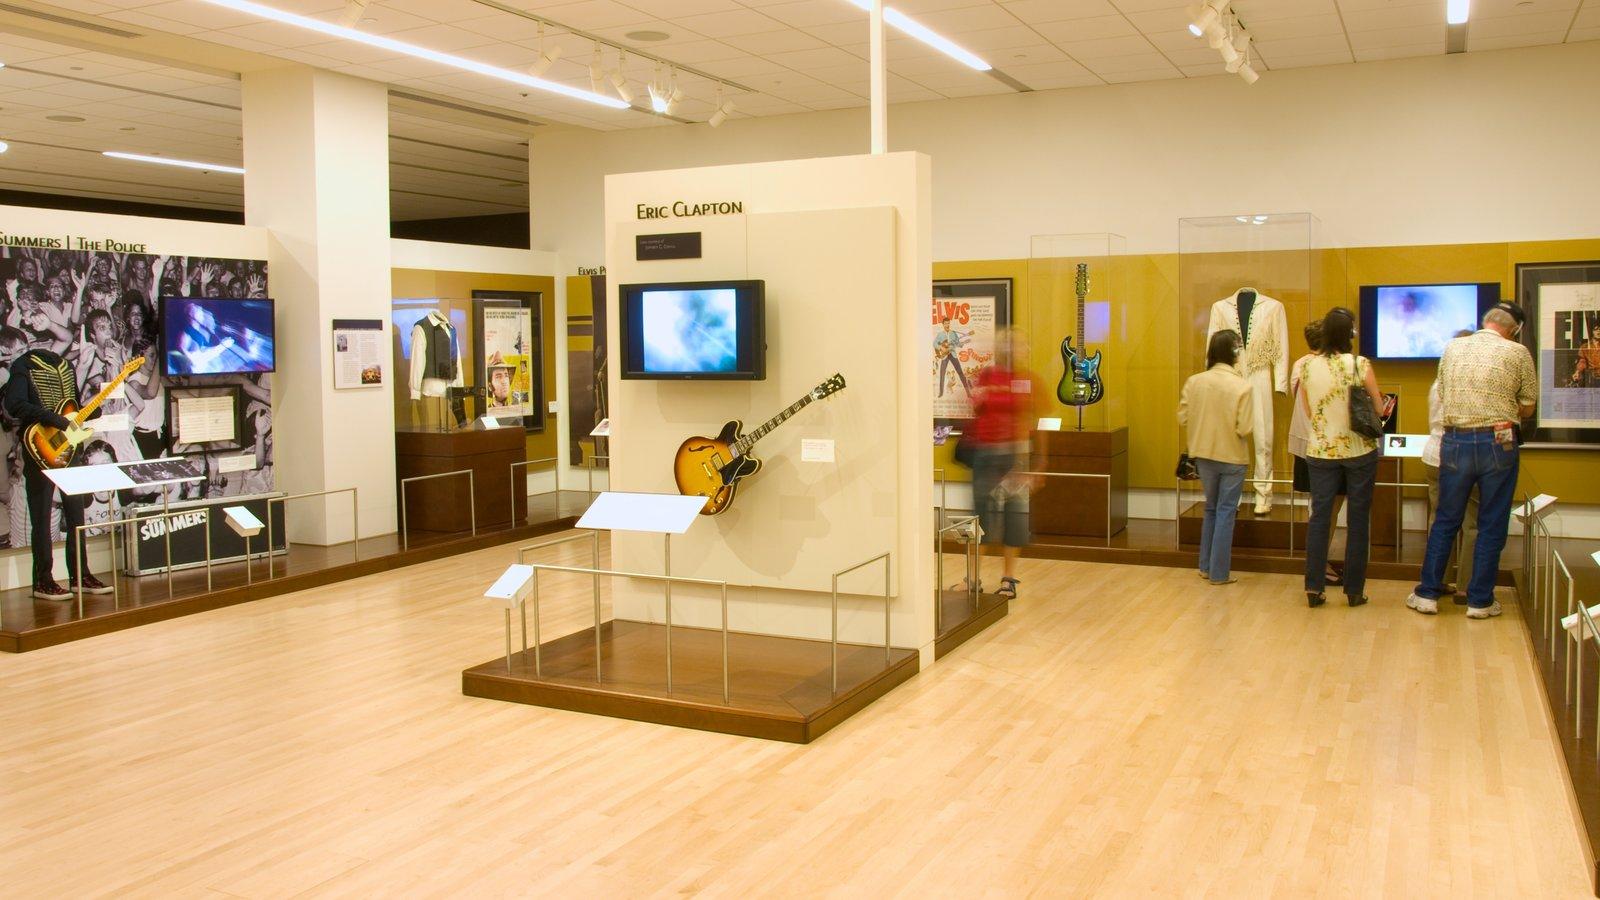 Museu dos Instrumentos Musicais caracterizando vistas internas e música